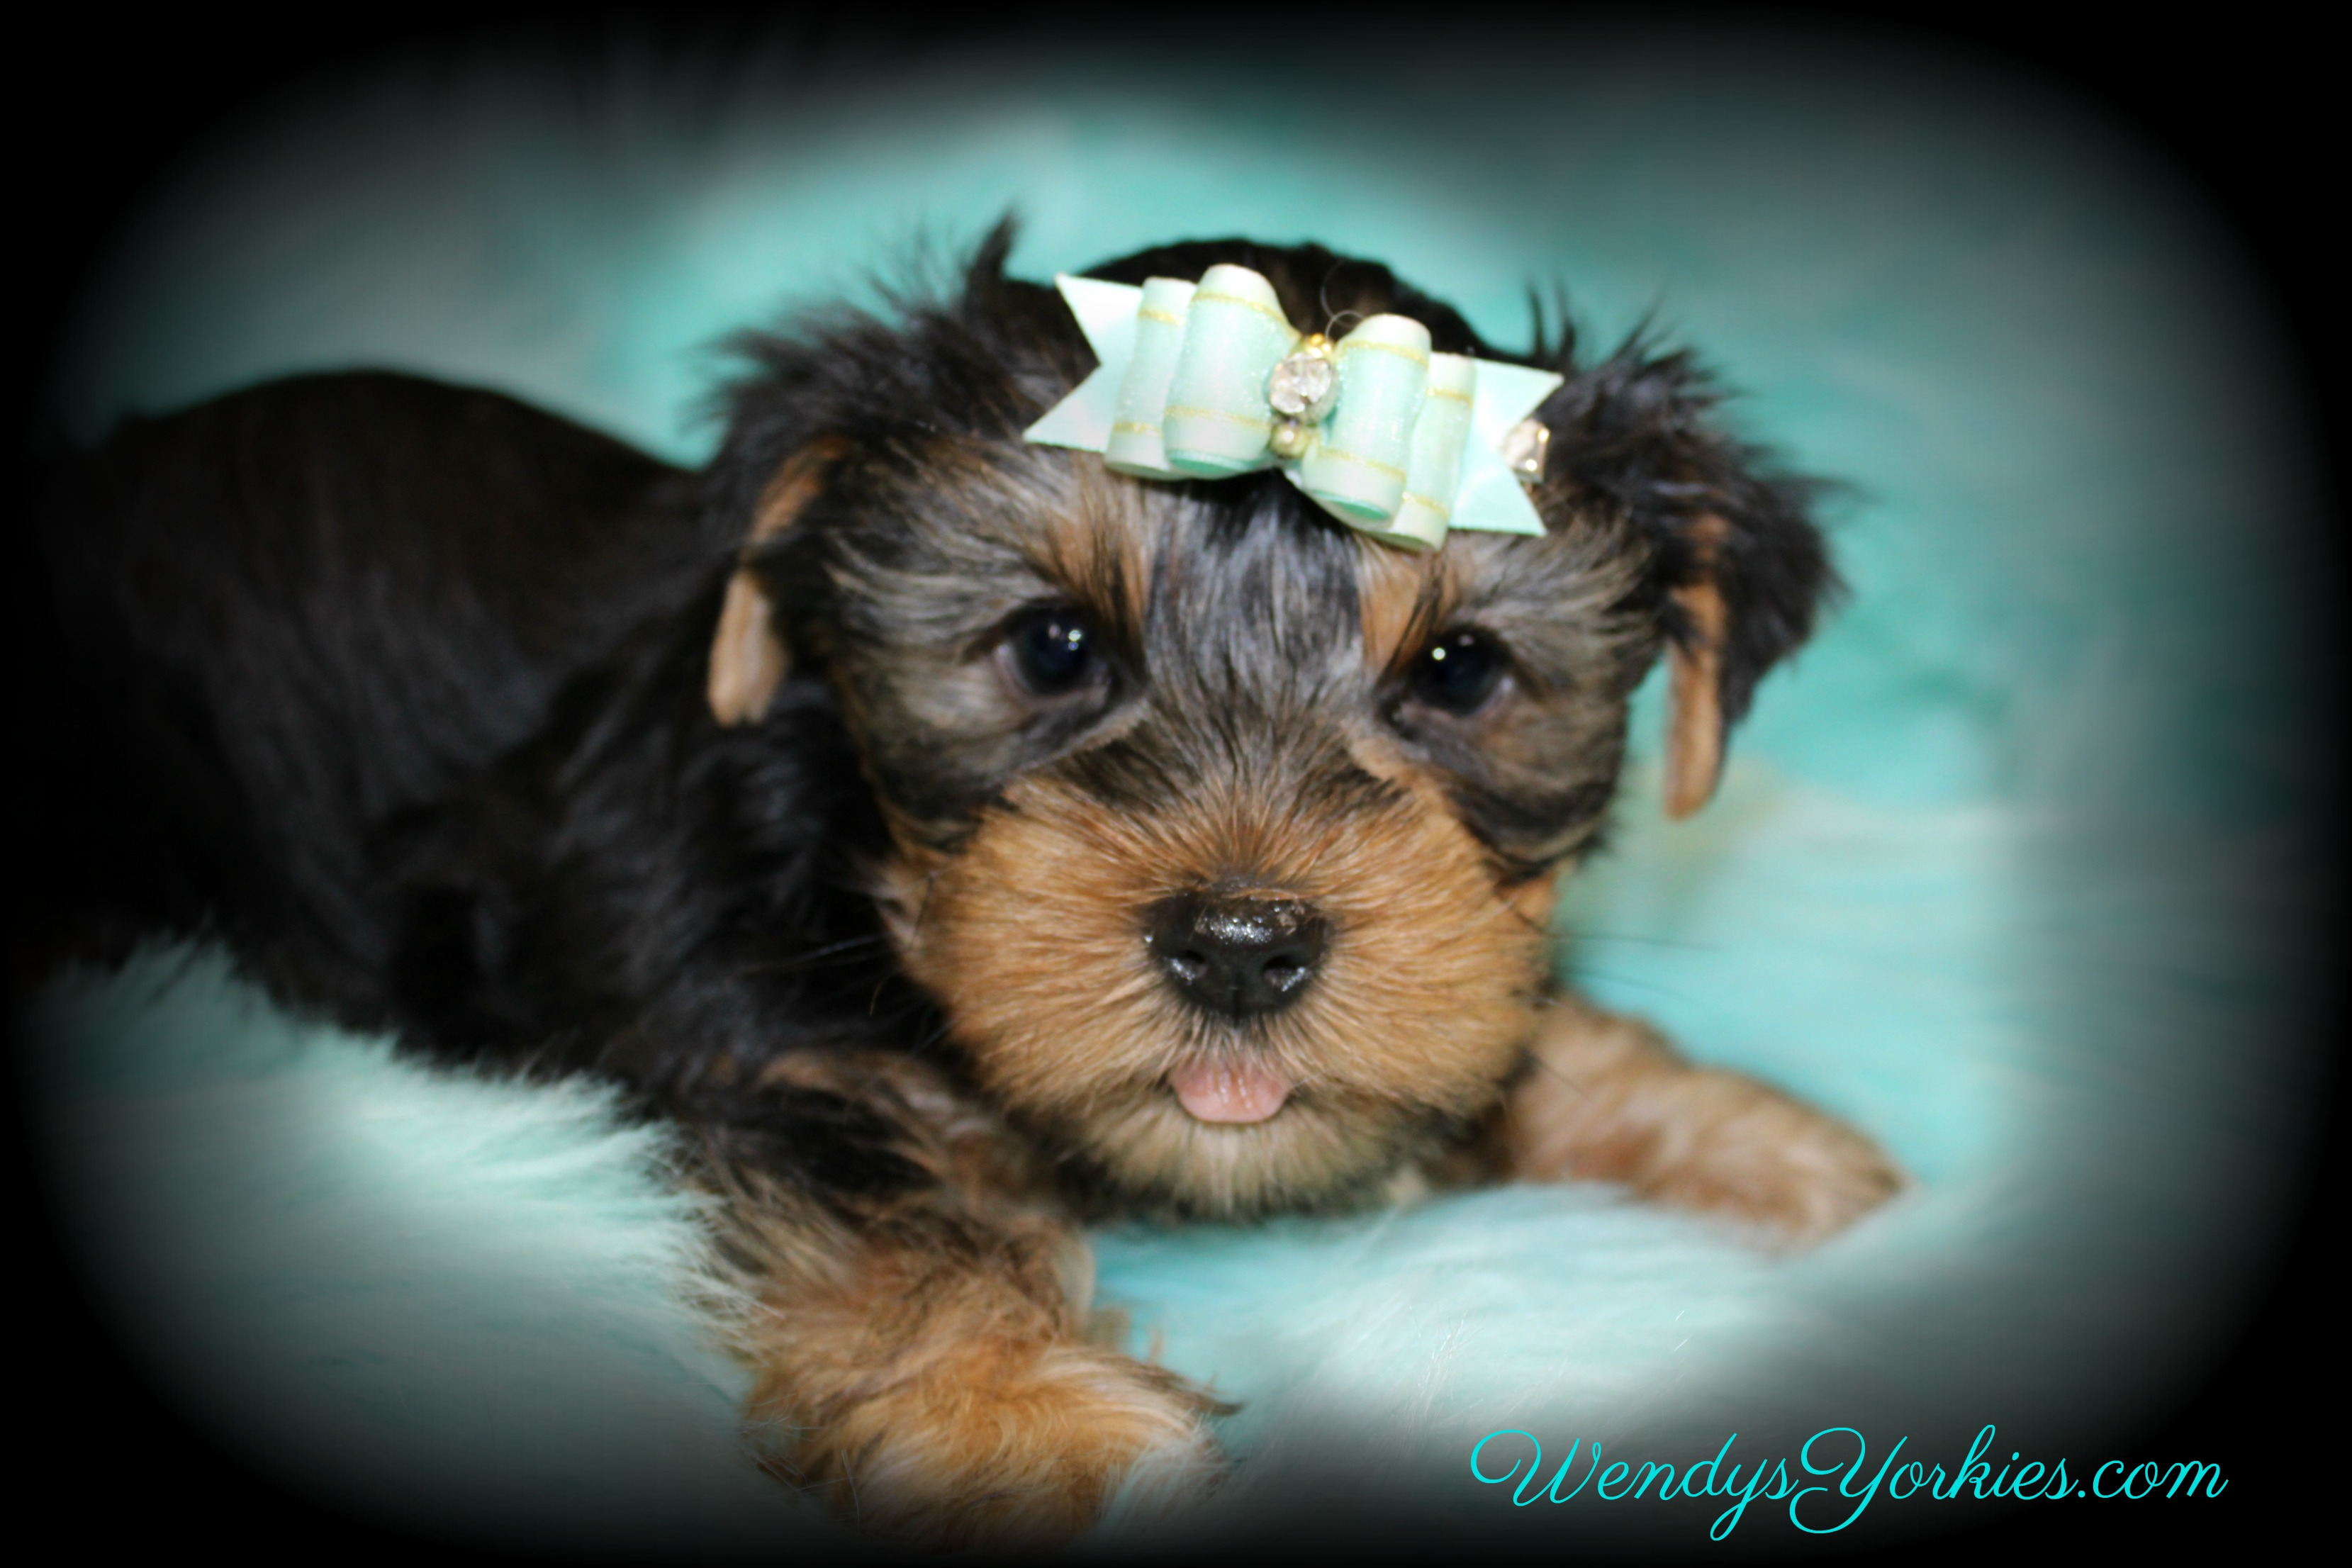 Male Yorkie puppy for sale, Lee, WendysYorkies.com